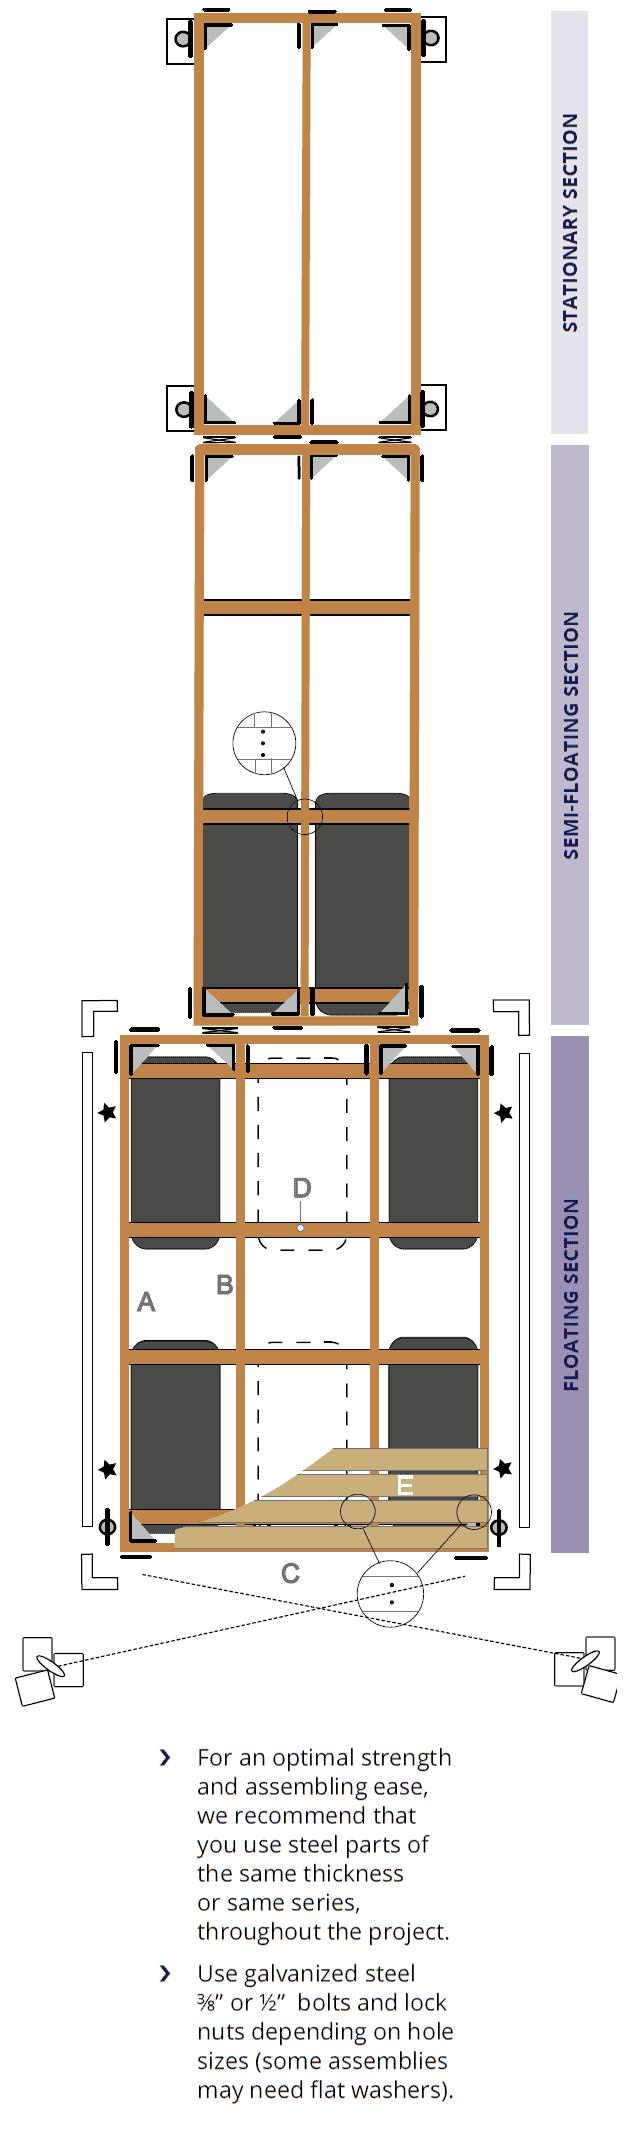 How to build a wooden dock - DIY | Multinautic